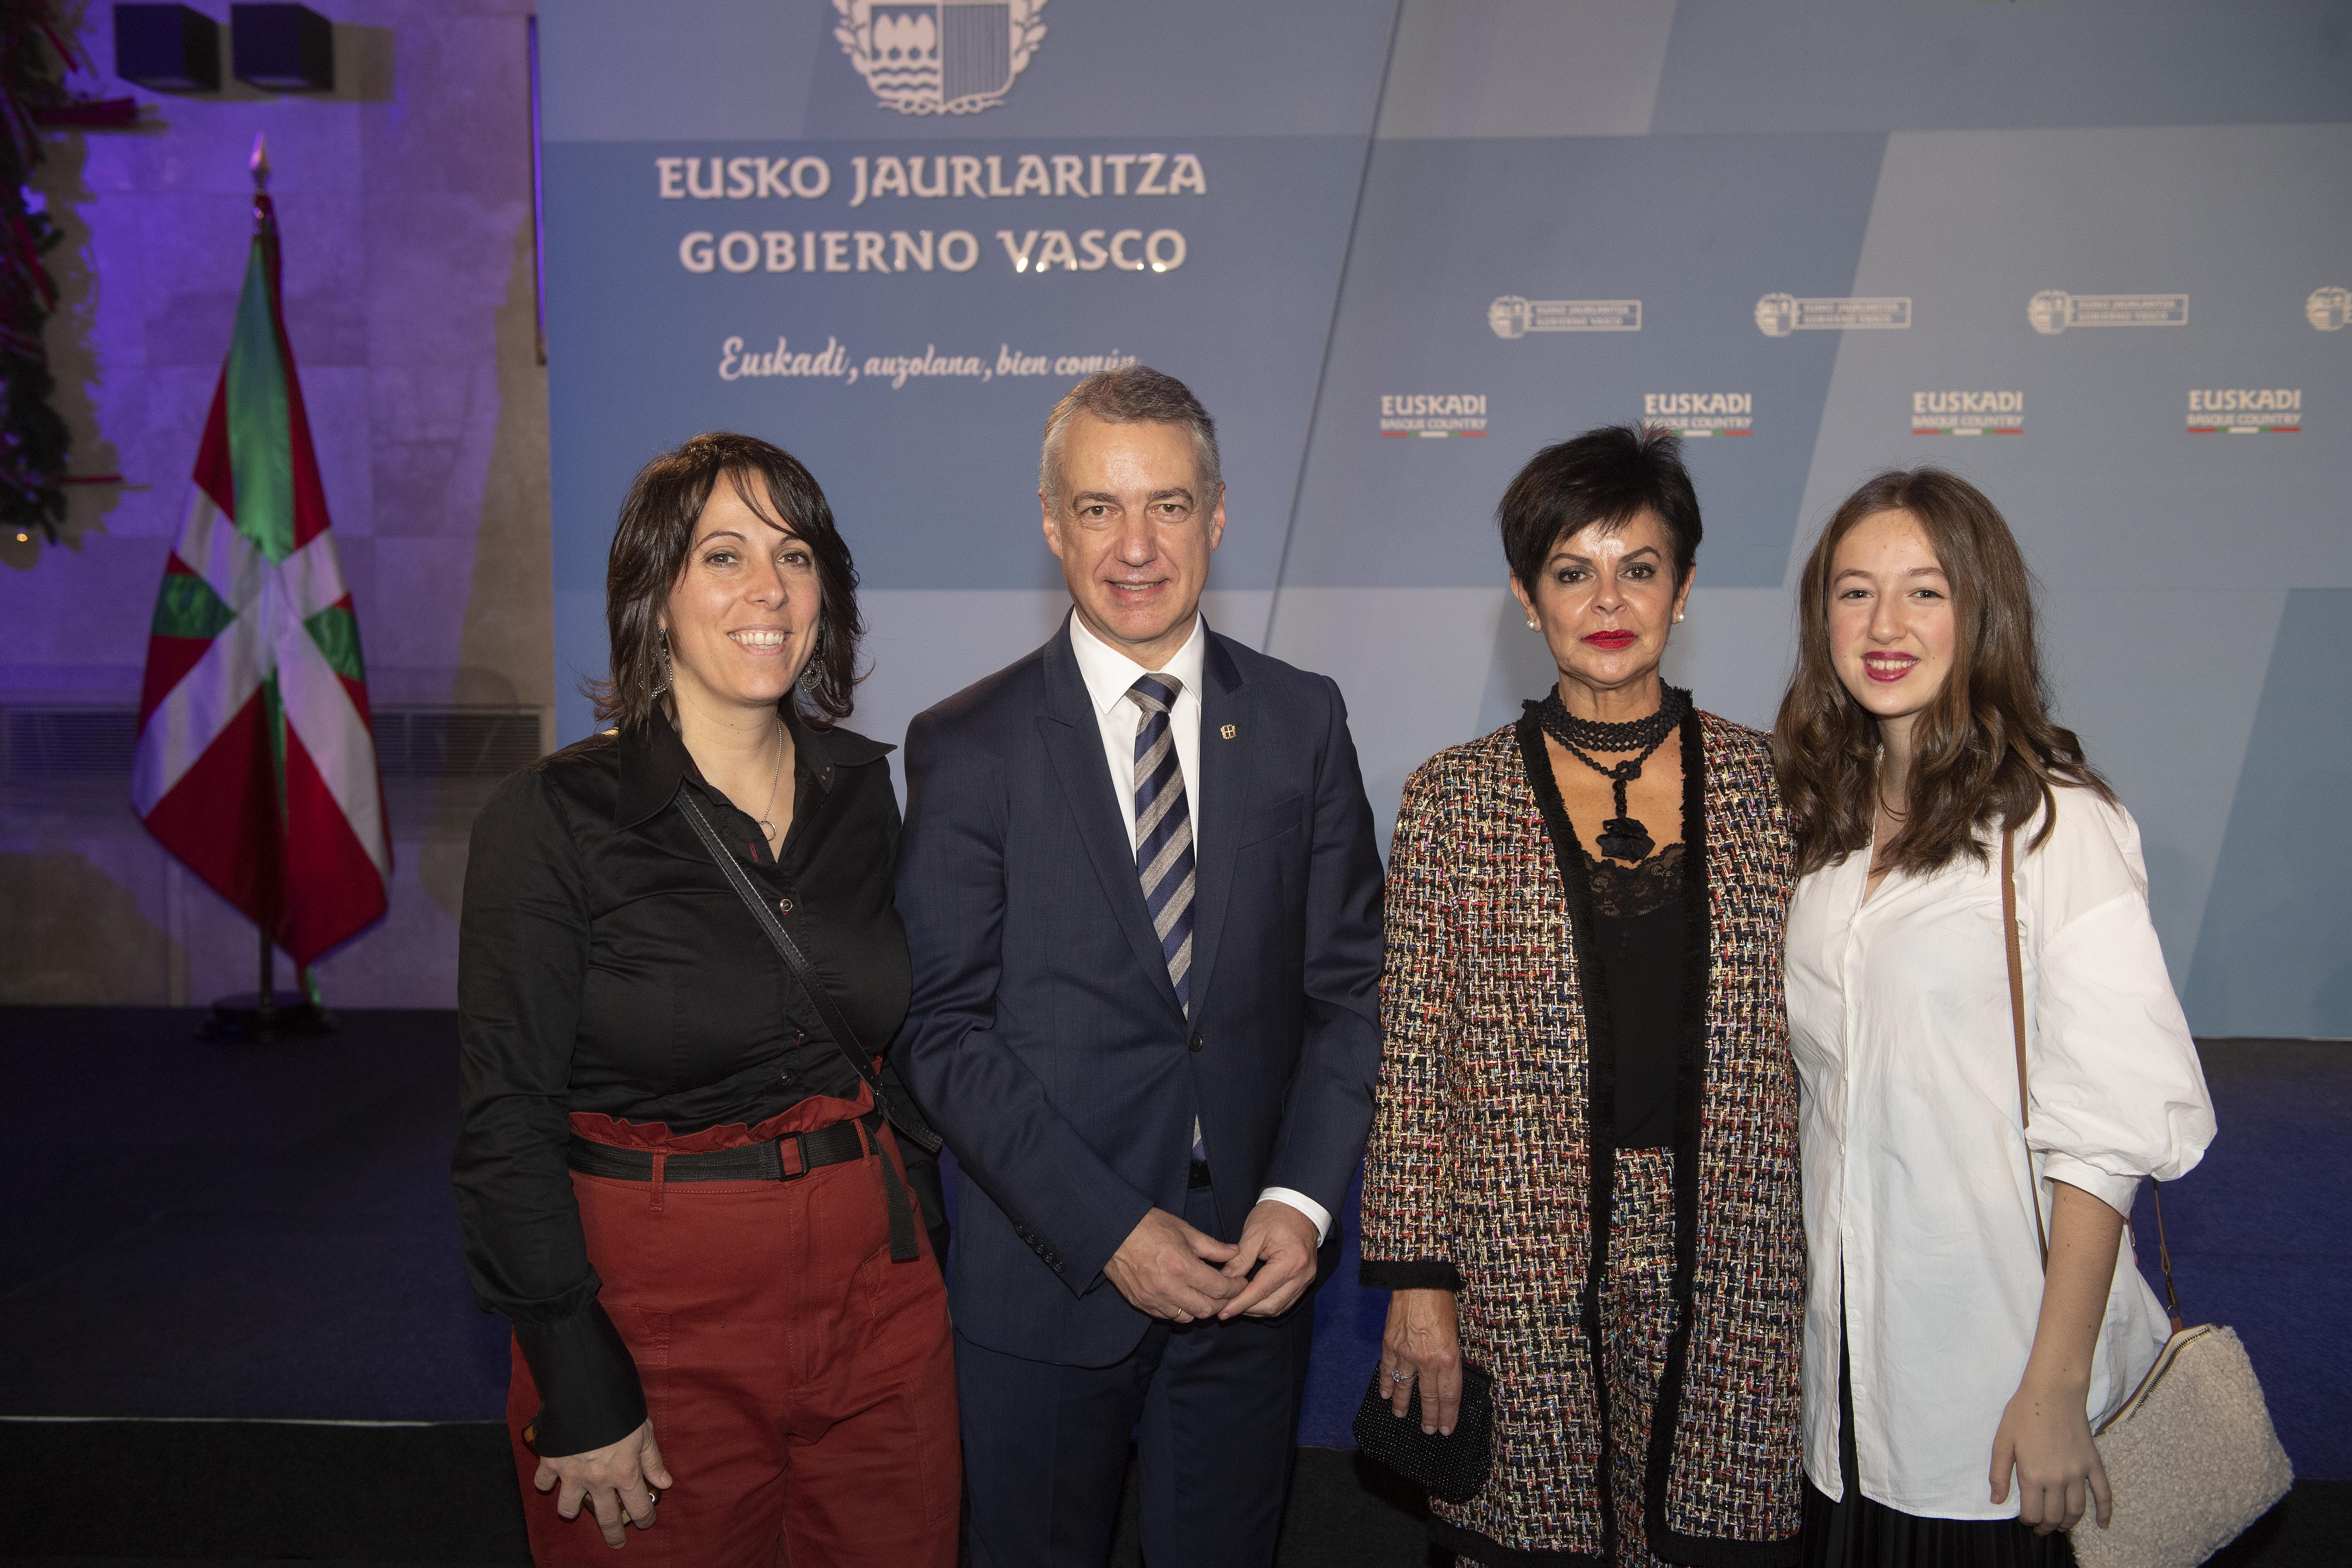 2019_12_20_lhk_socieadad_vasca_98.jpg